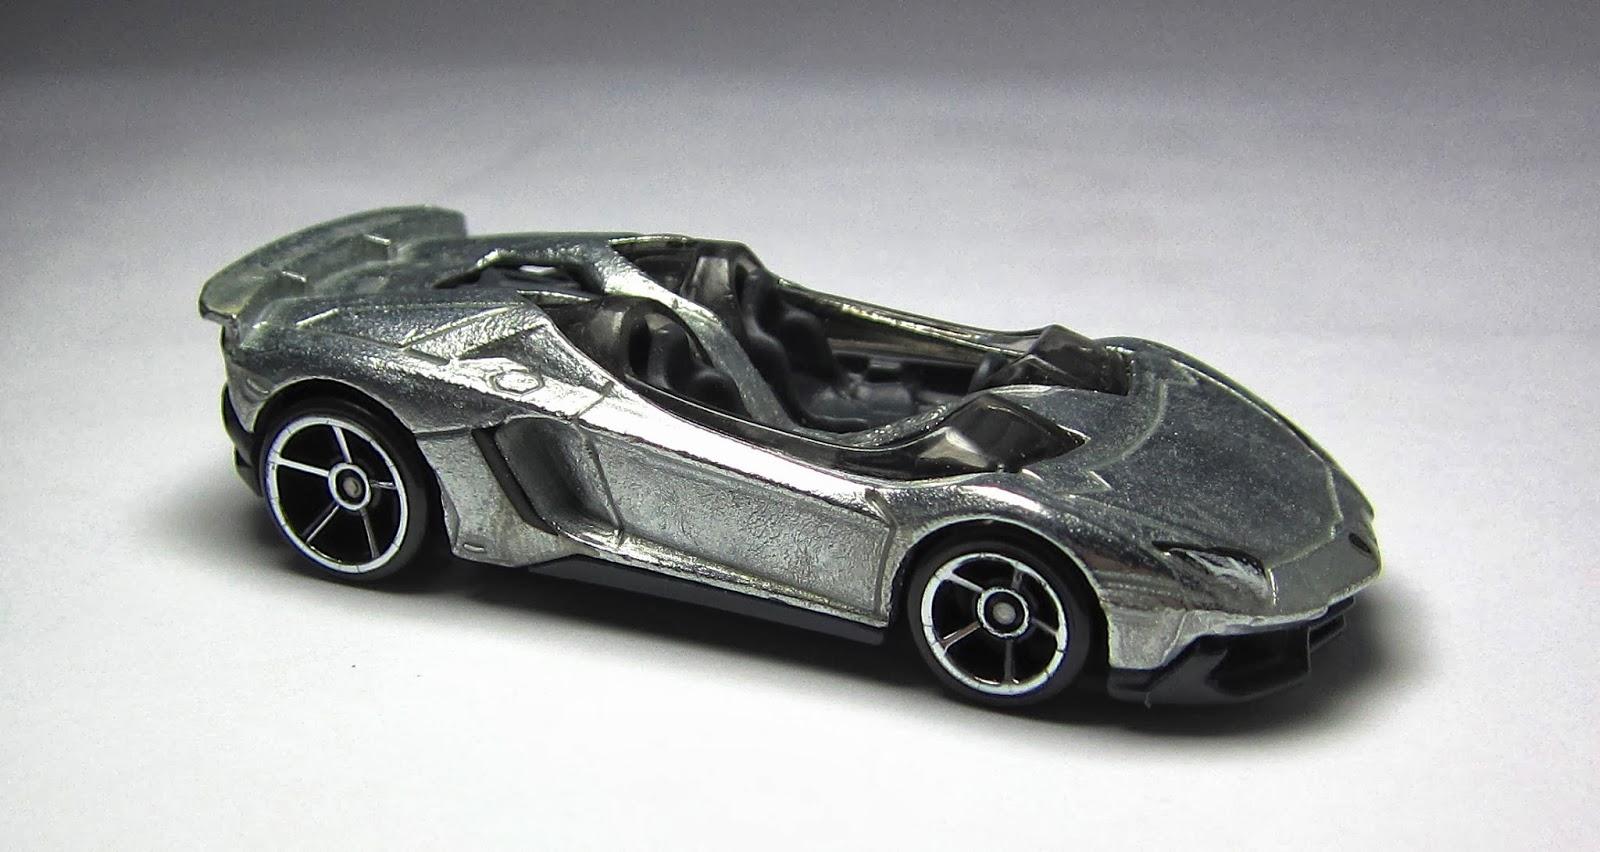 hot wheels lamborghini aventador j 2013 walmart zamac exclusive